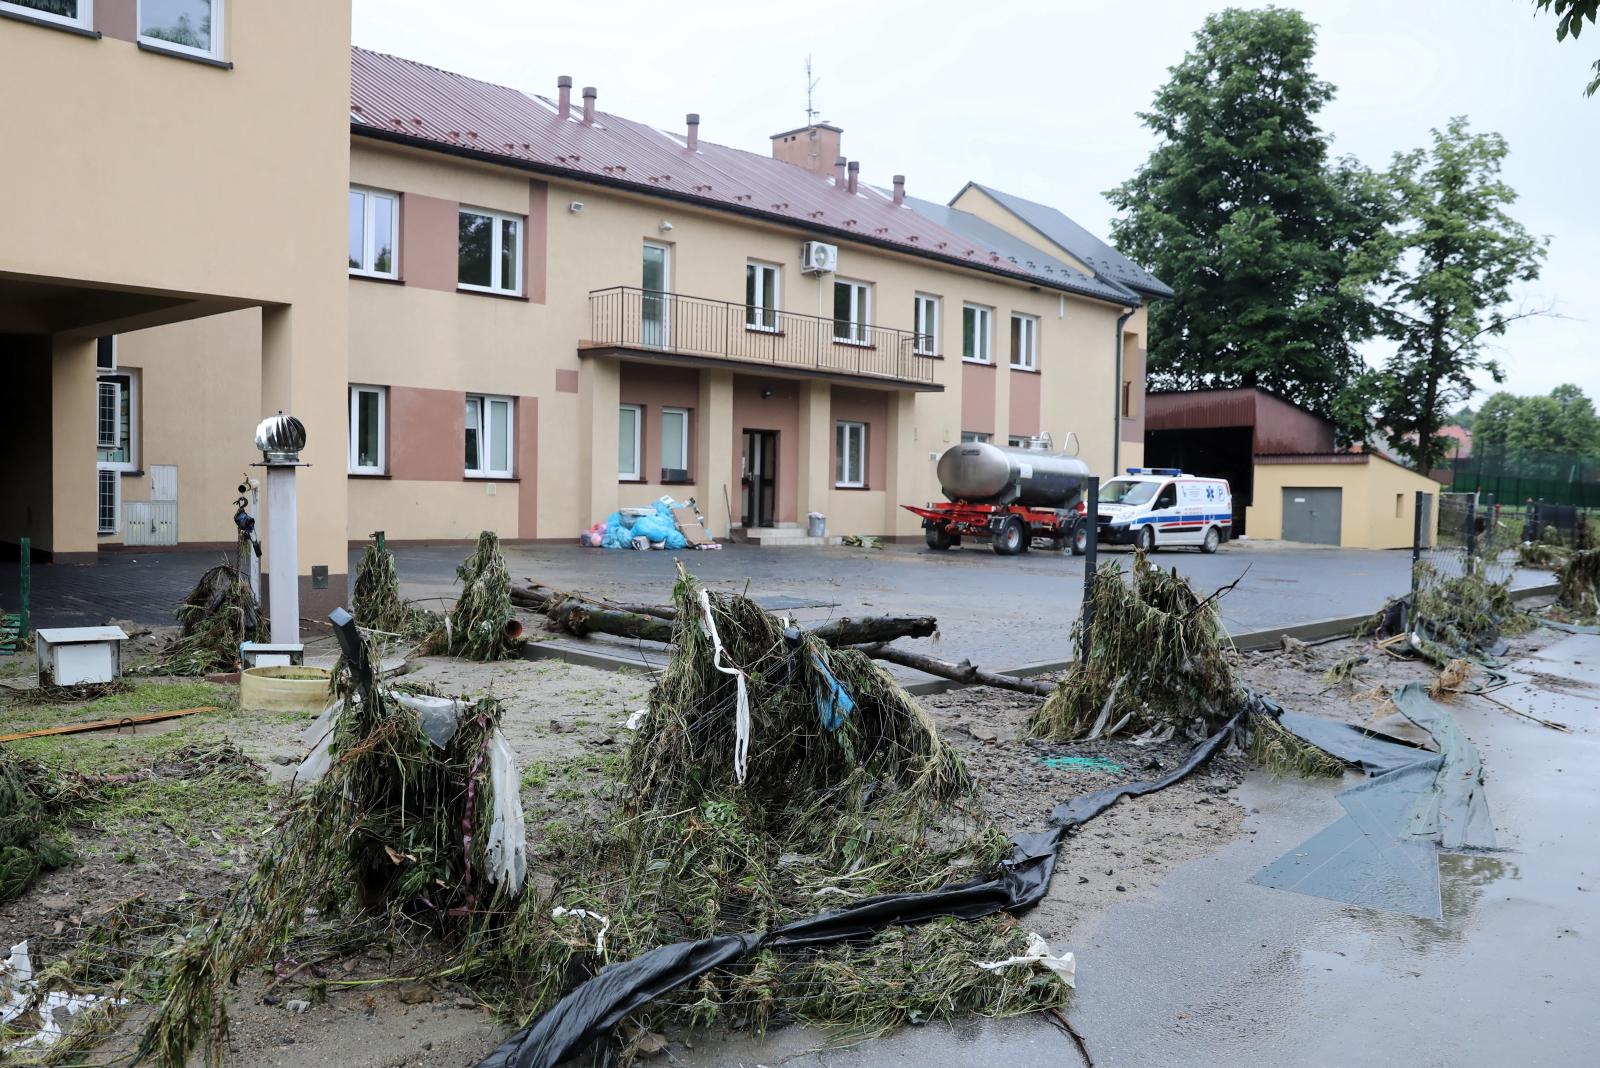 Heavy rain and flooding hit a hospital in Szczyrzyc, Lesser Poland.